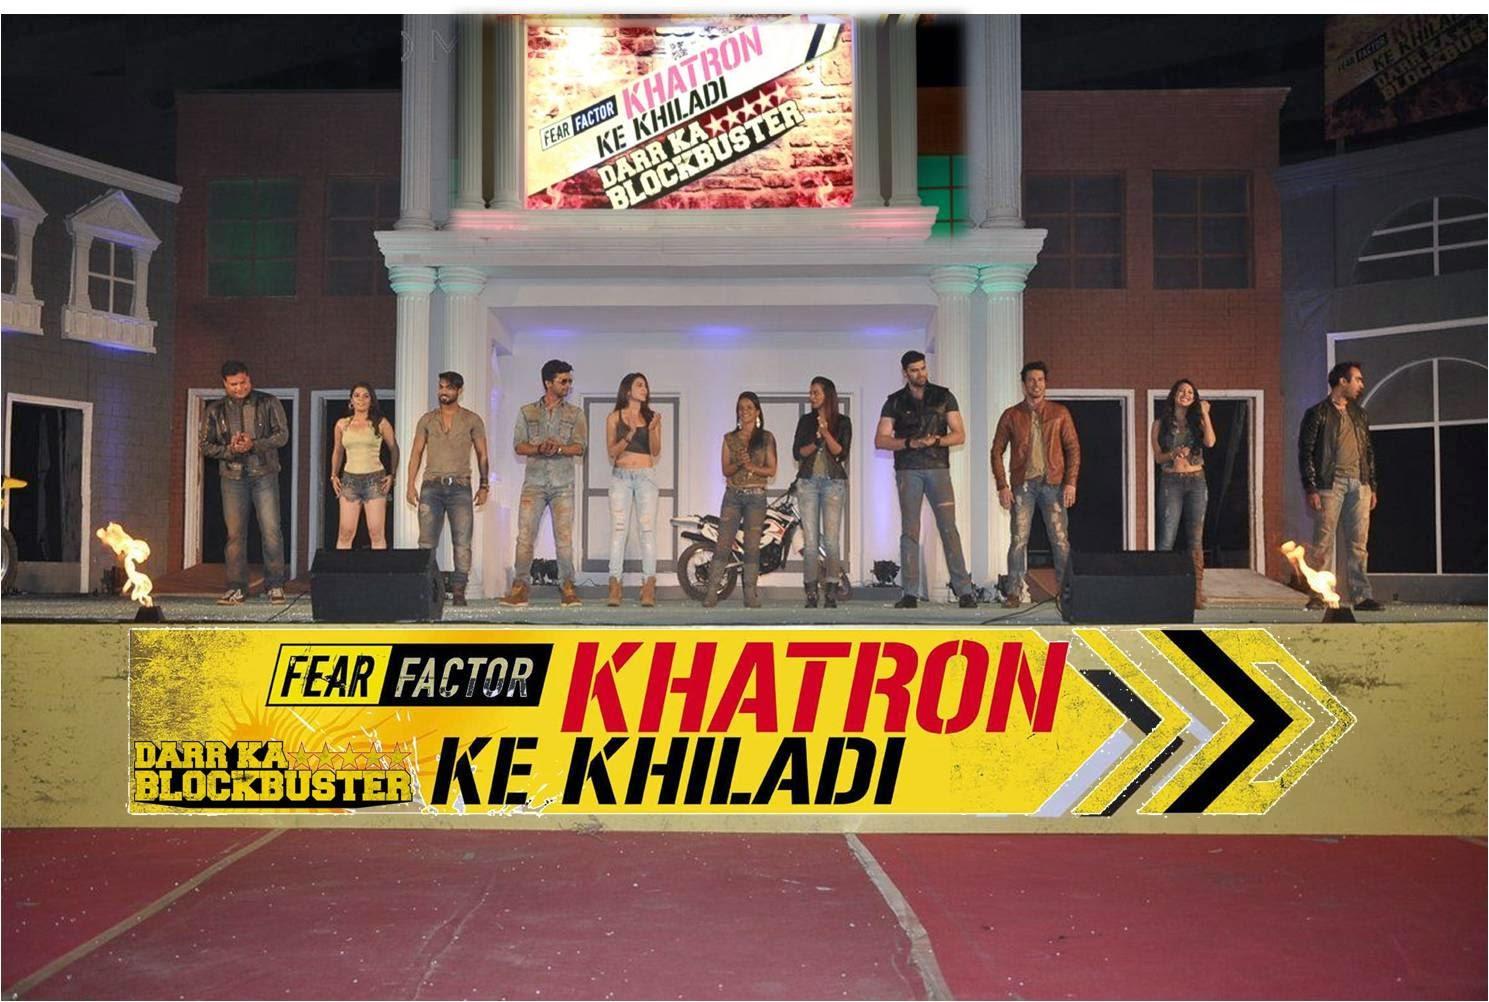 17 Contestants of Fear Factor Khatron Ke Khiladi Season 5: Dar Ka Blockbuster with Rohit Shetty